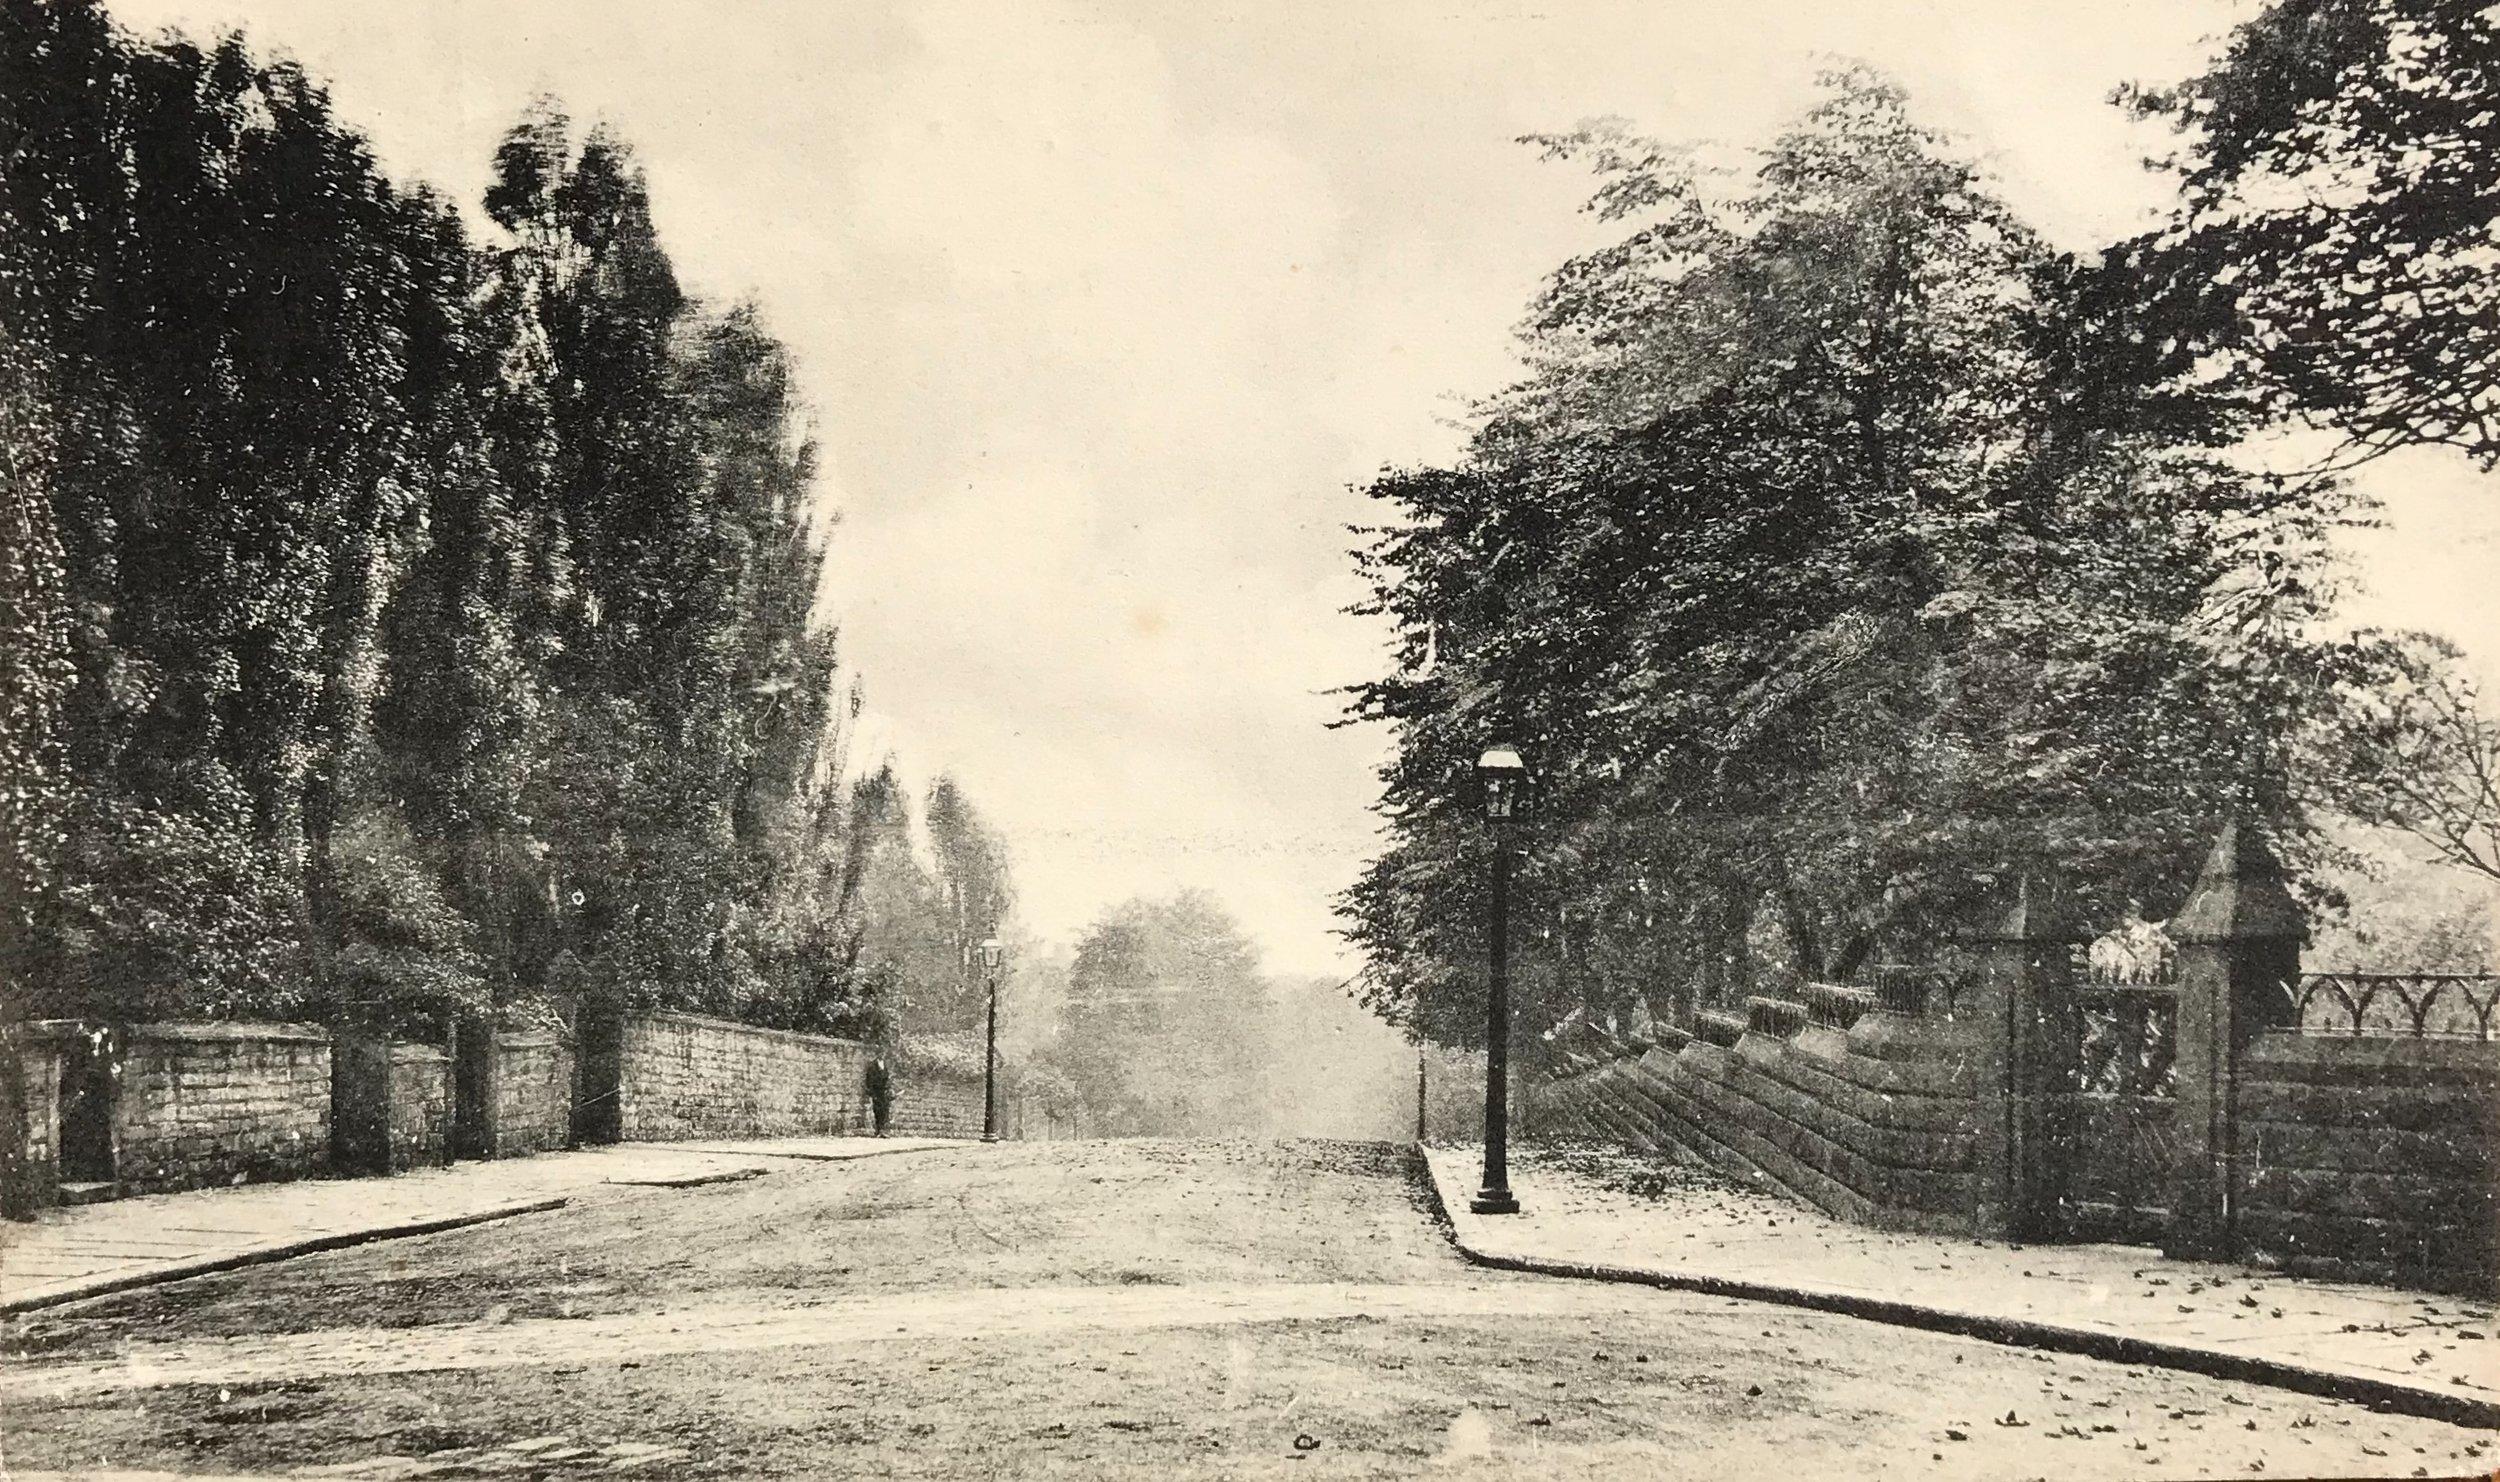 Bainbrigge Road, from Headingley Lane